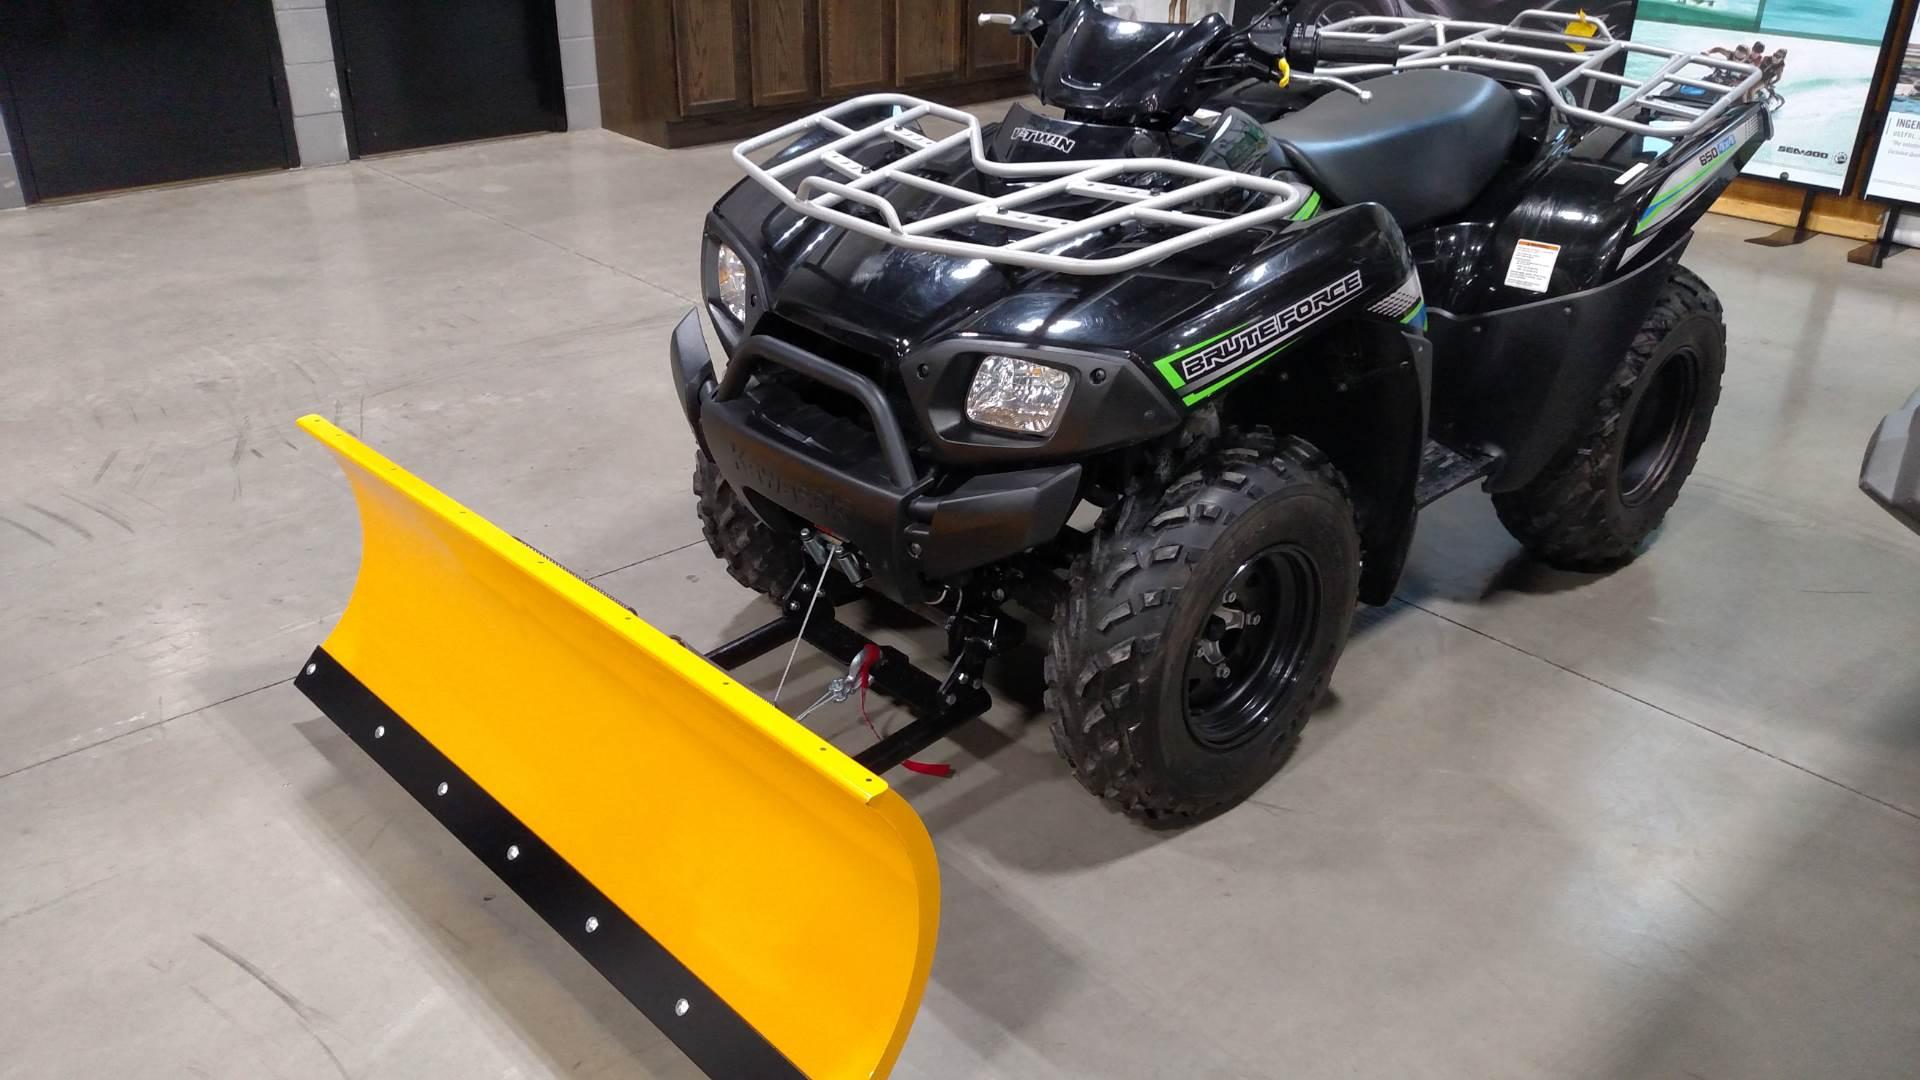 2012 Brute Force 650 4x4